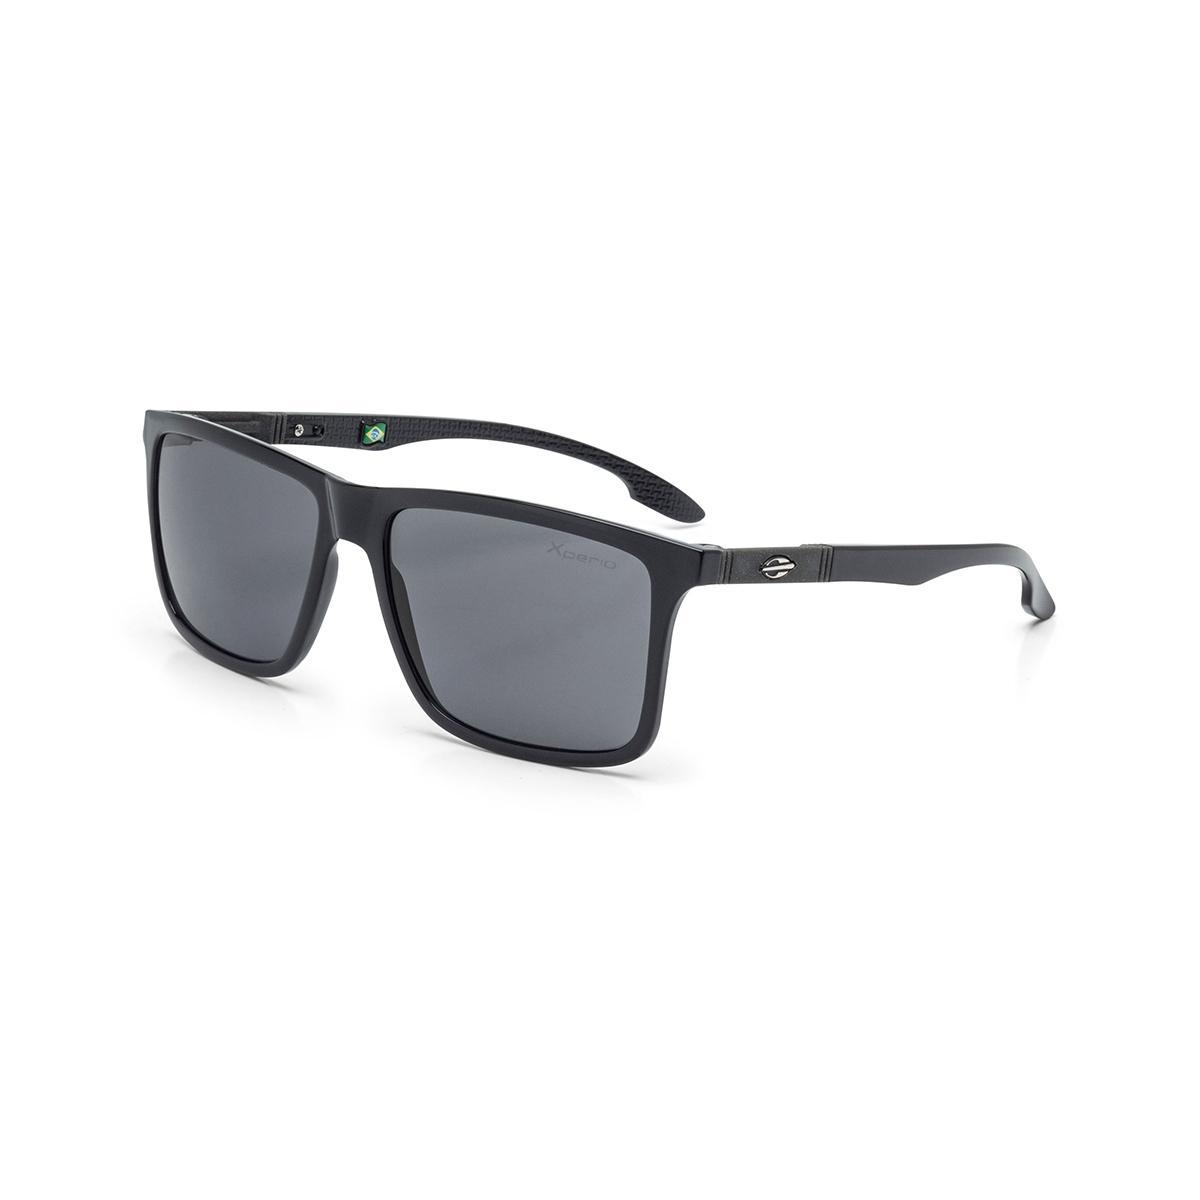 Óculos de Sol Mormaii KONA M0036 A02 03 Preto Lente Polarizada Cinza Tam 54  R  369,99 à vista. Adicionar à sacola 7818785c8d